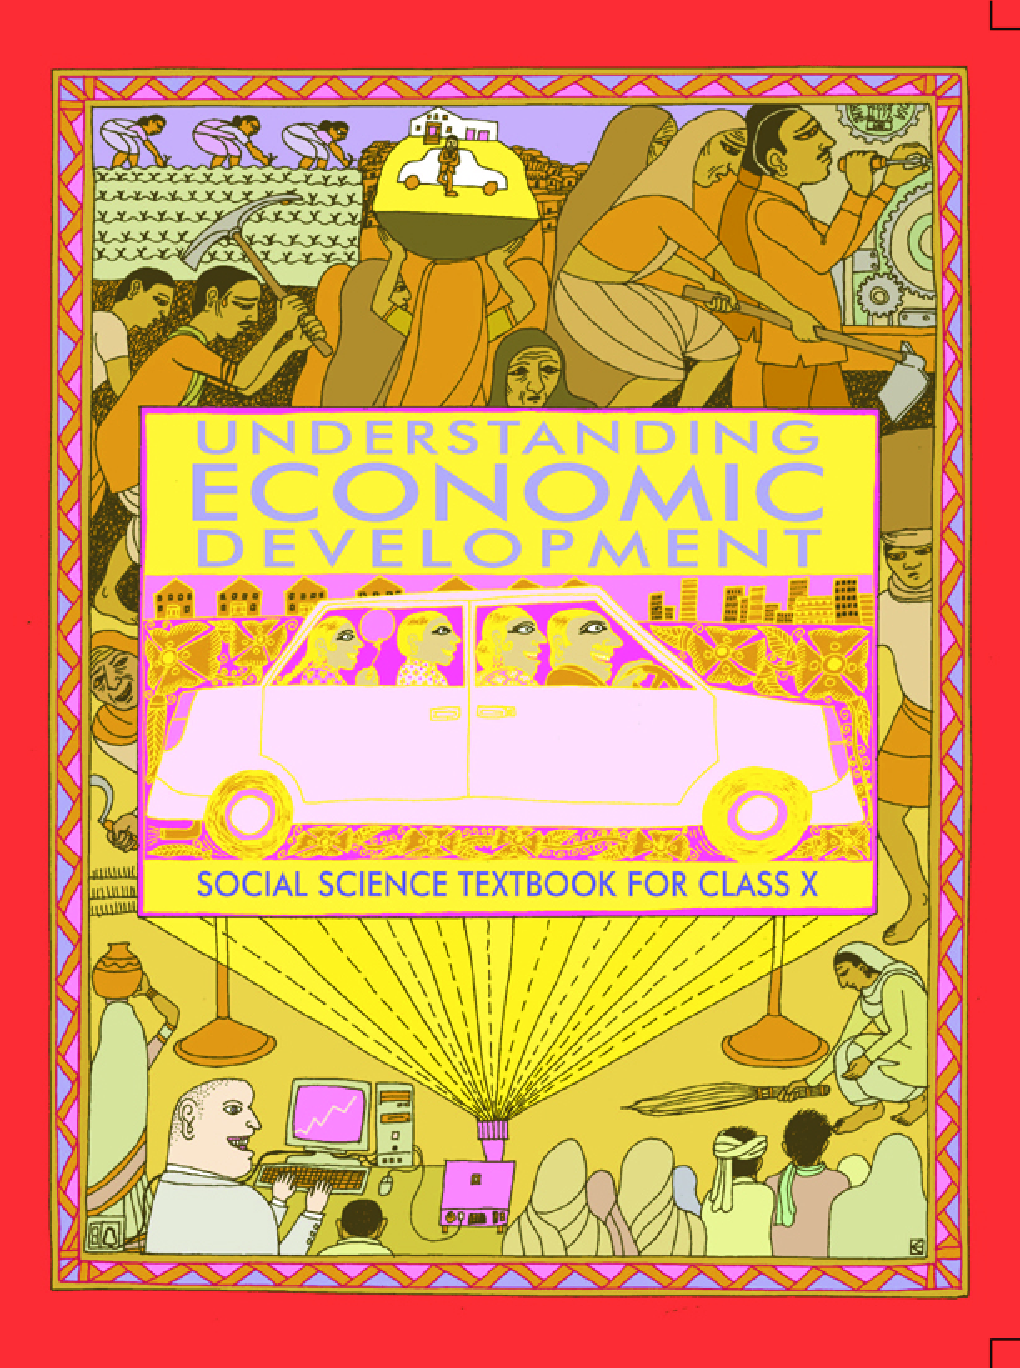 NCERT Understanding Economic Development Social Science Textbook For Class X - Page 1